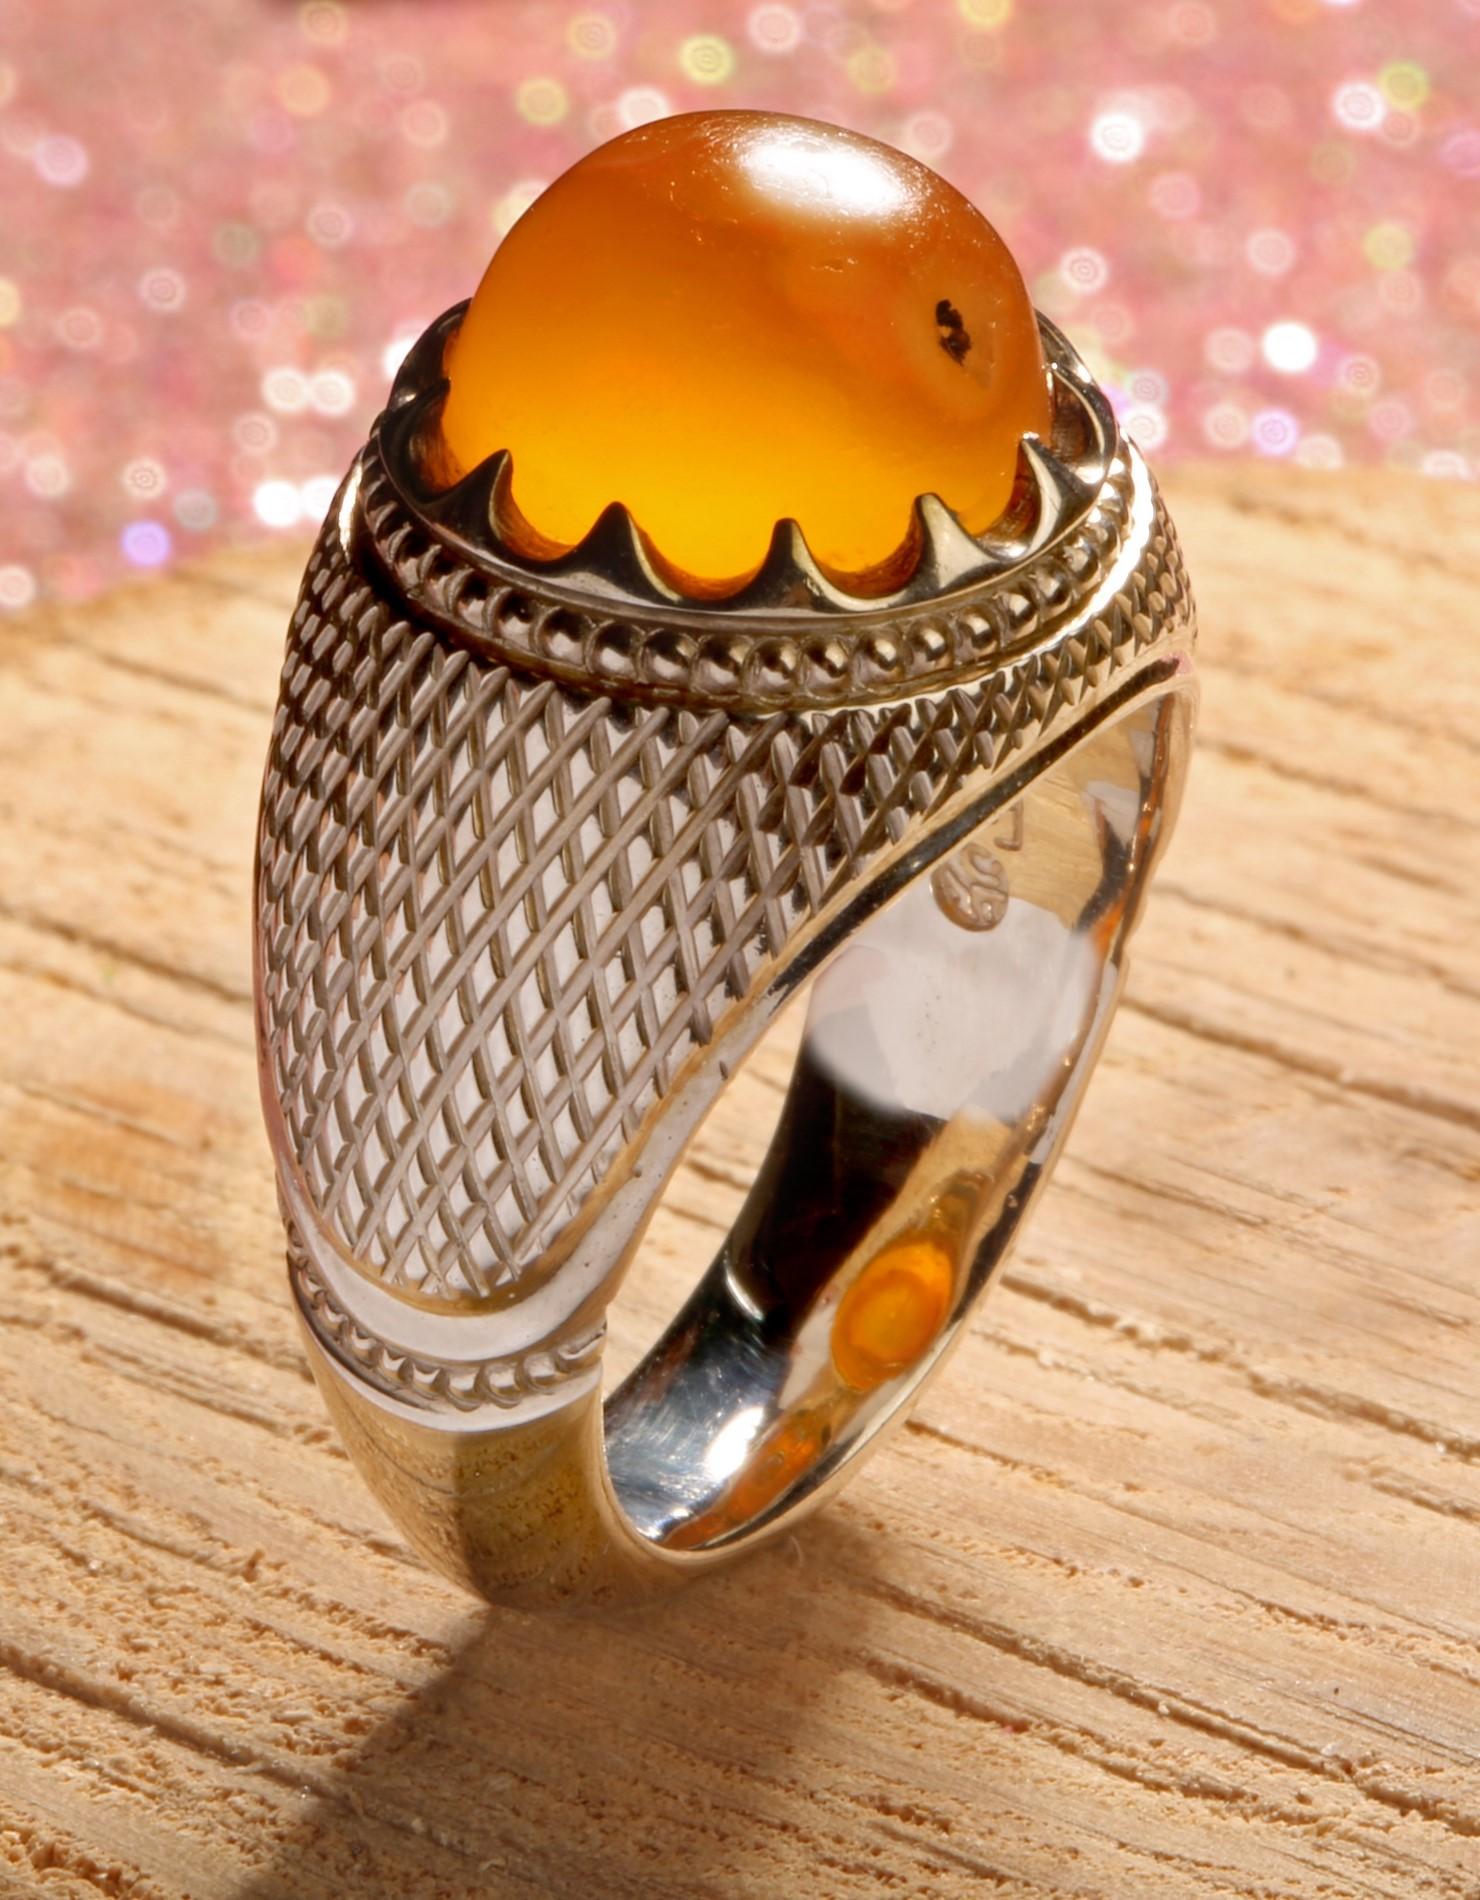 A-1525 انگشتر عقیق زرد یمنی کهنه با تراش قطعی با پایه فدیوم دست ساز